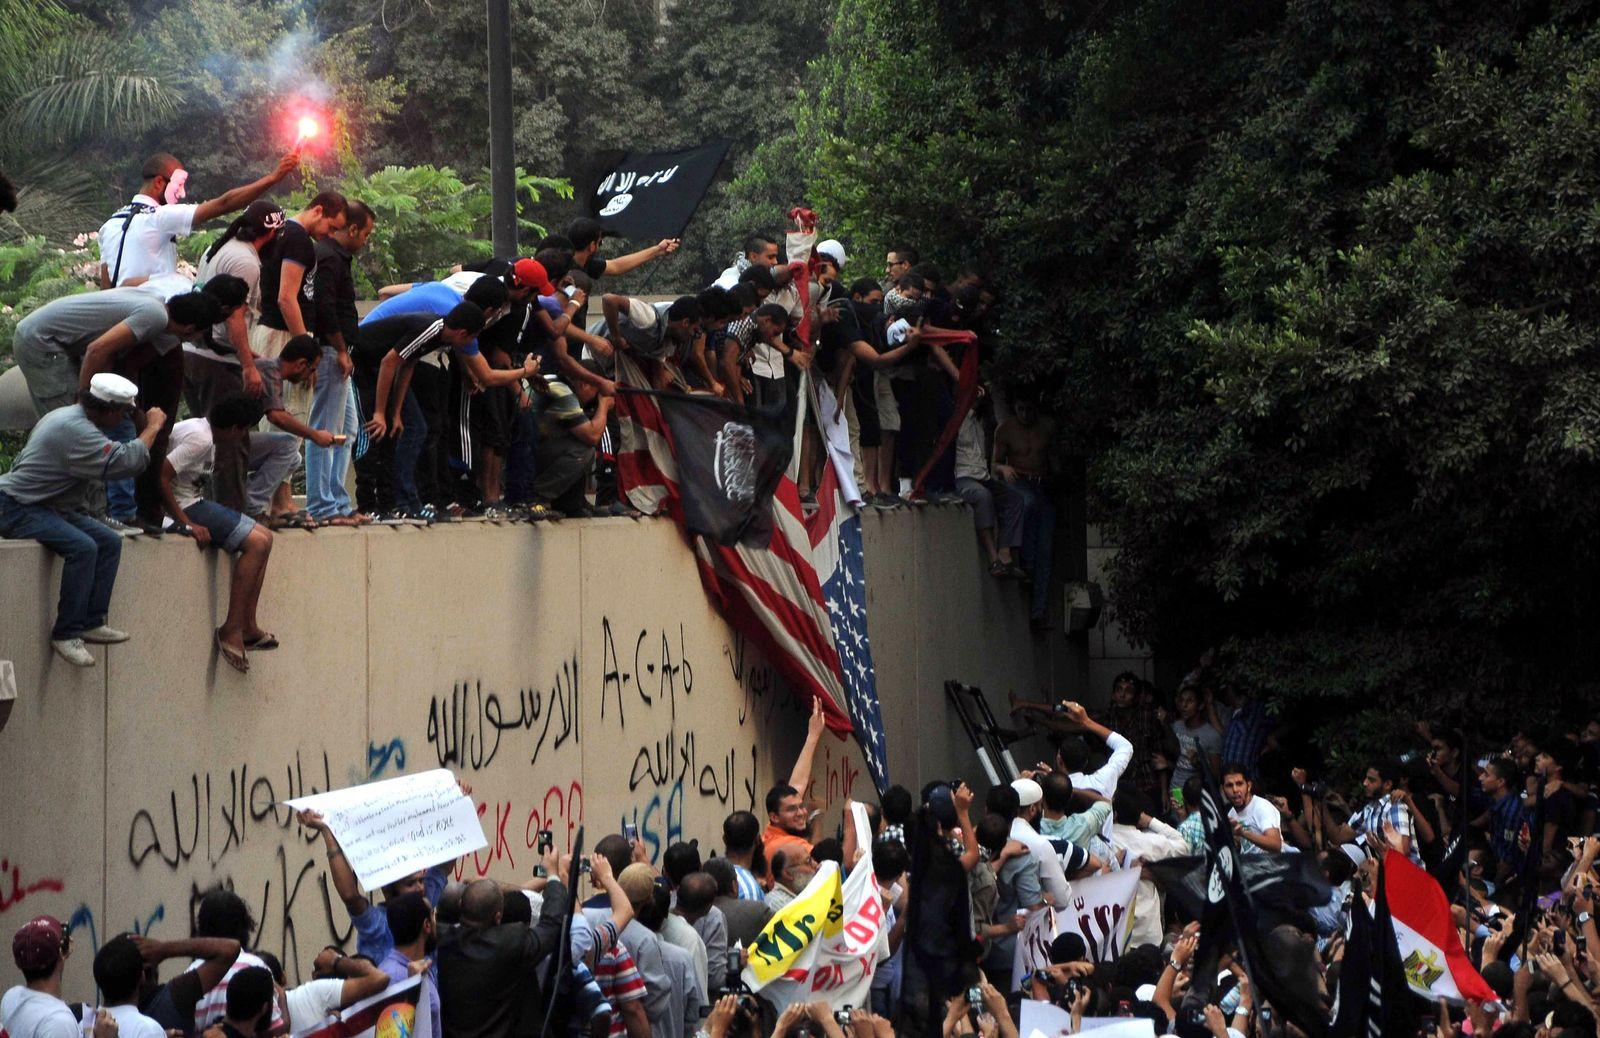 Kairo/Angriff auf US-Botschaft